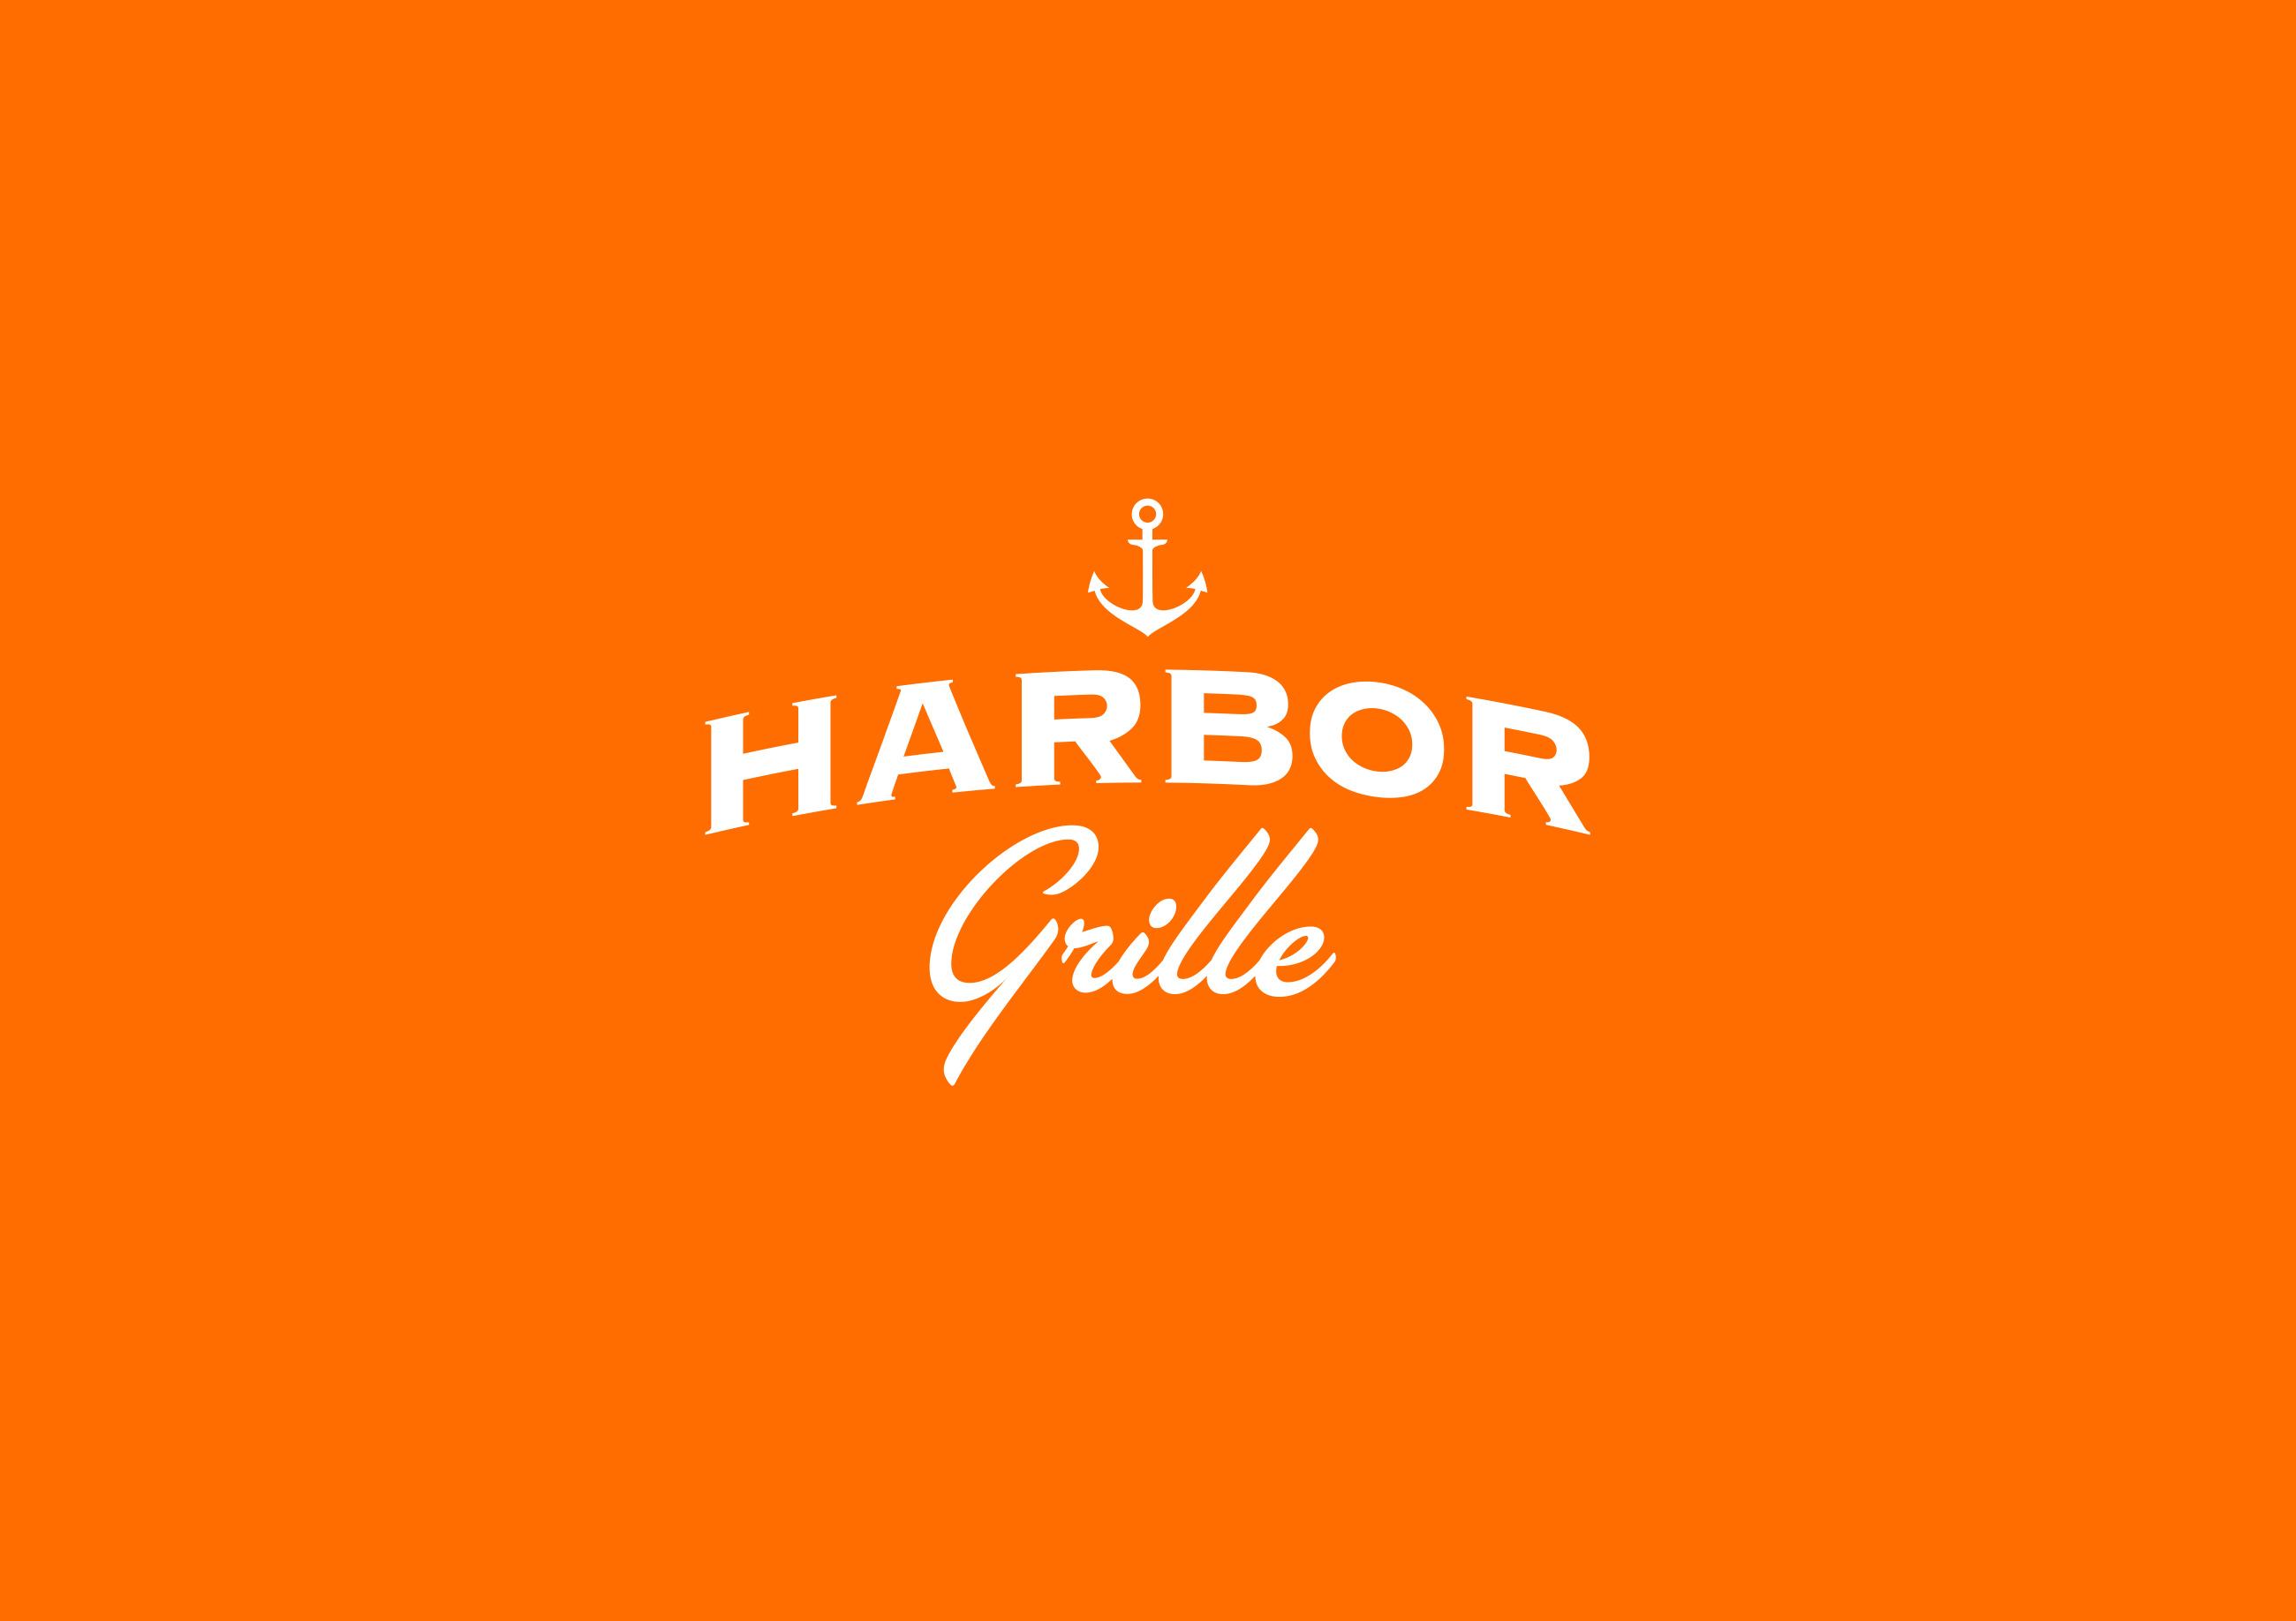 Harbor-Grille-logo-on-orange-2600x1836px